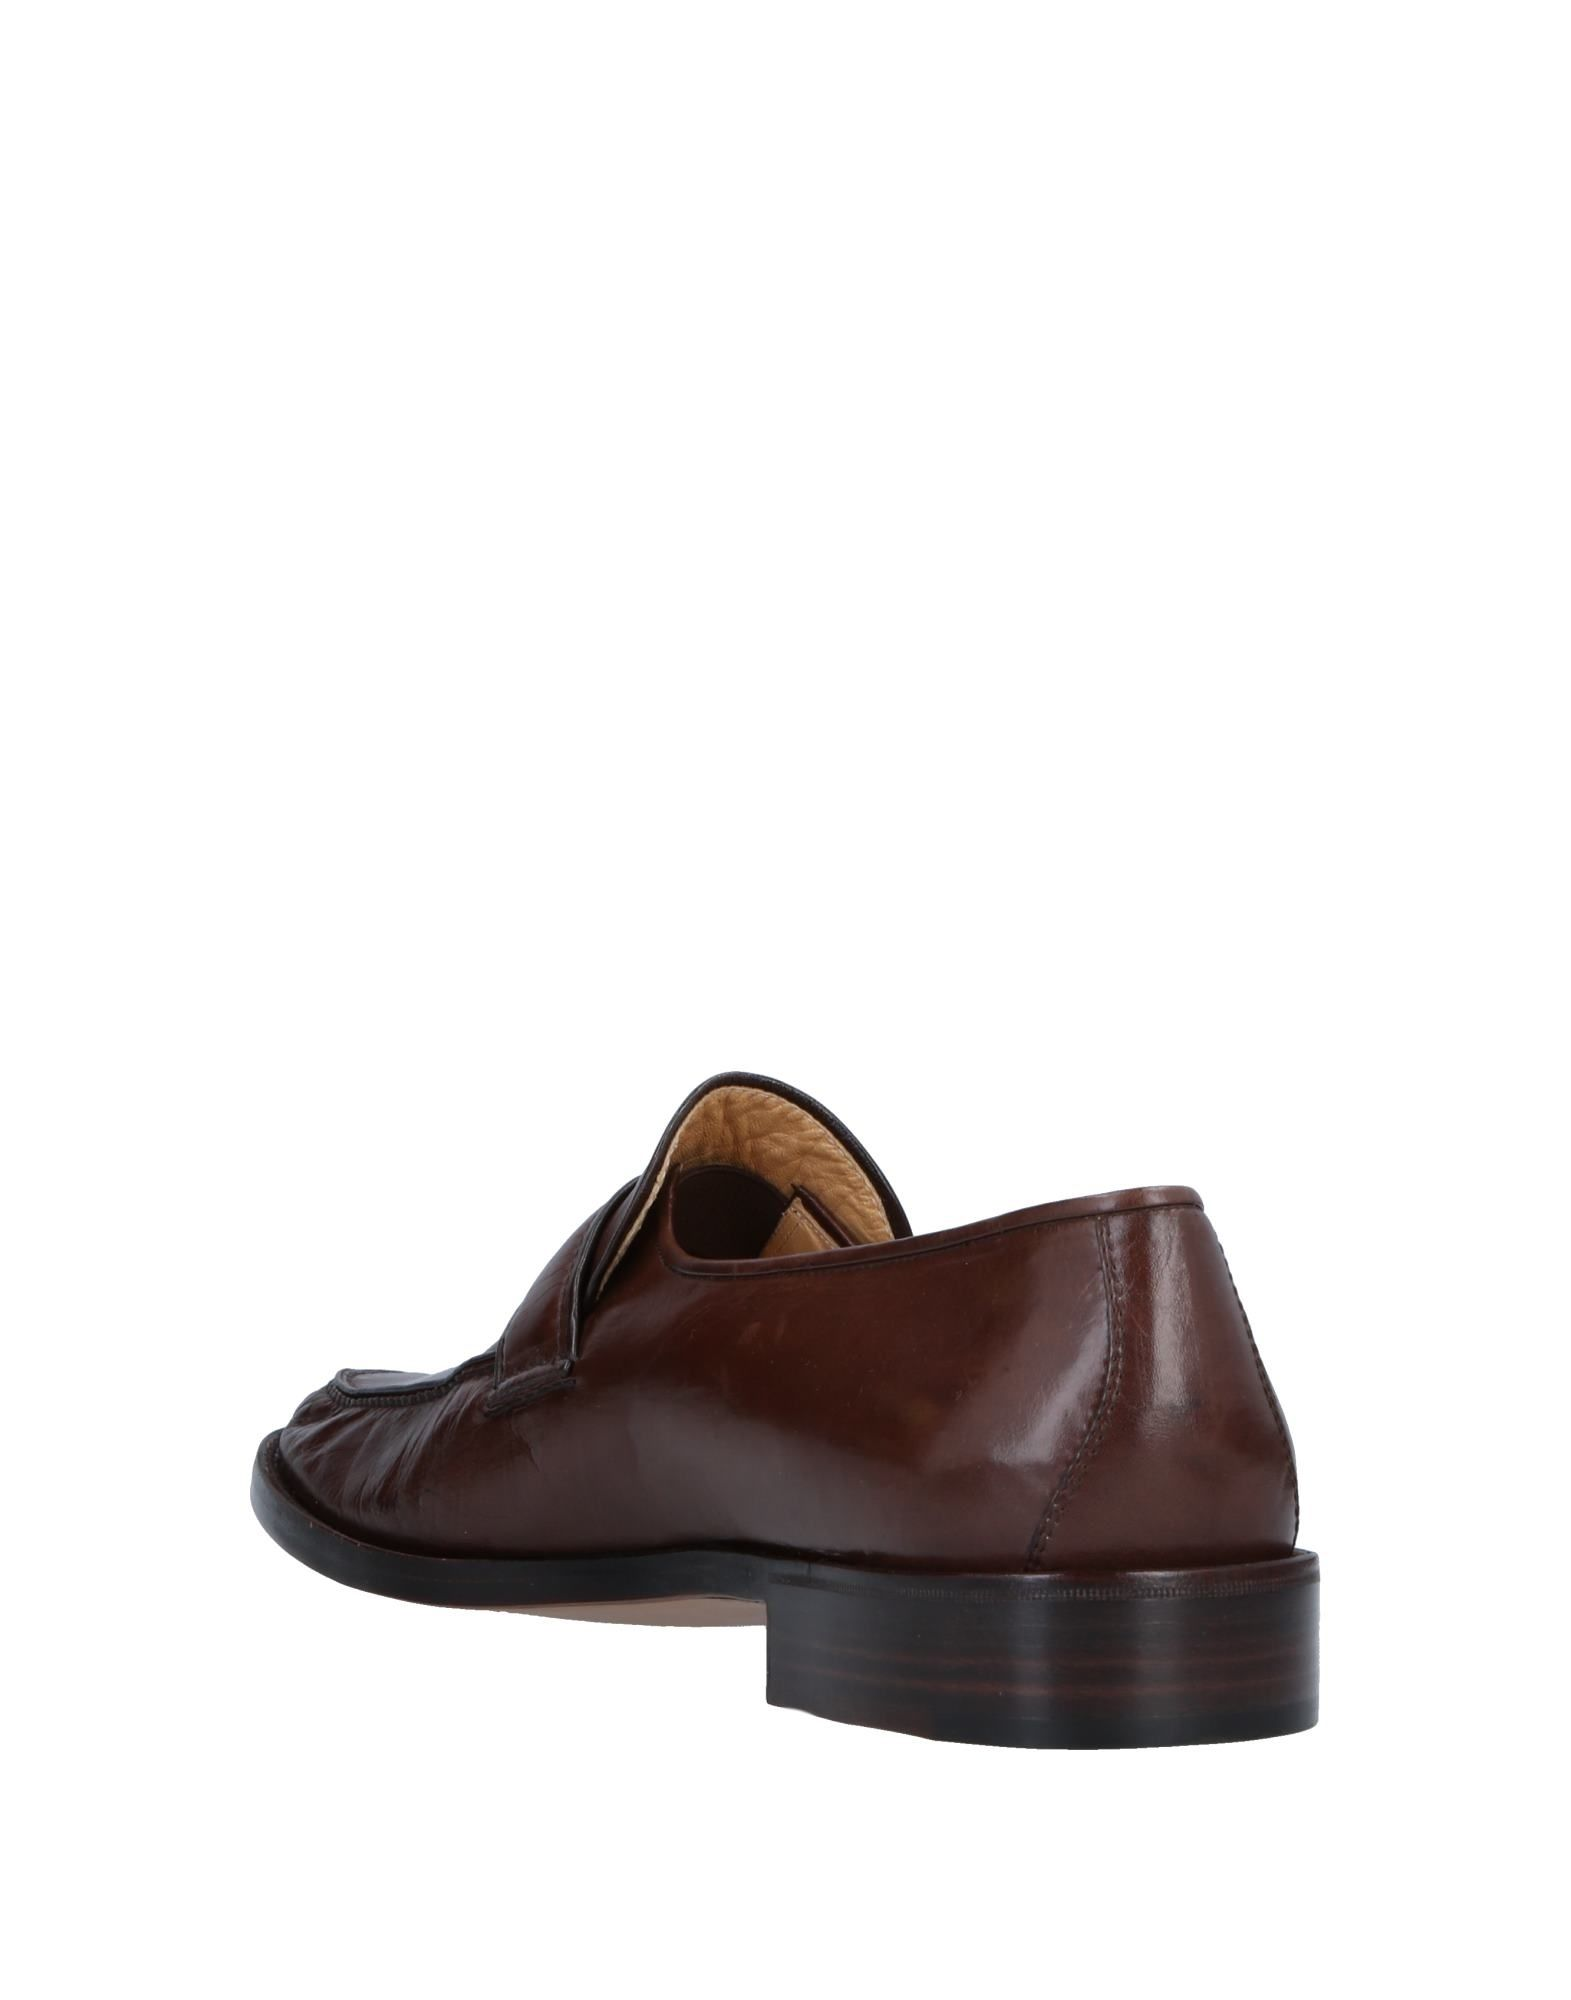 Rabatt echte Mokassins Schuhe Renzo Favero Mokassins echte Herren  11544980AX 7fbc4a